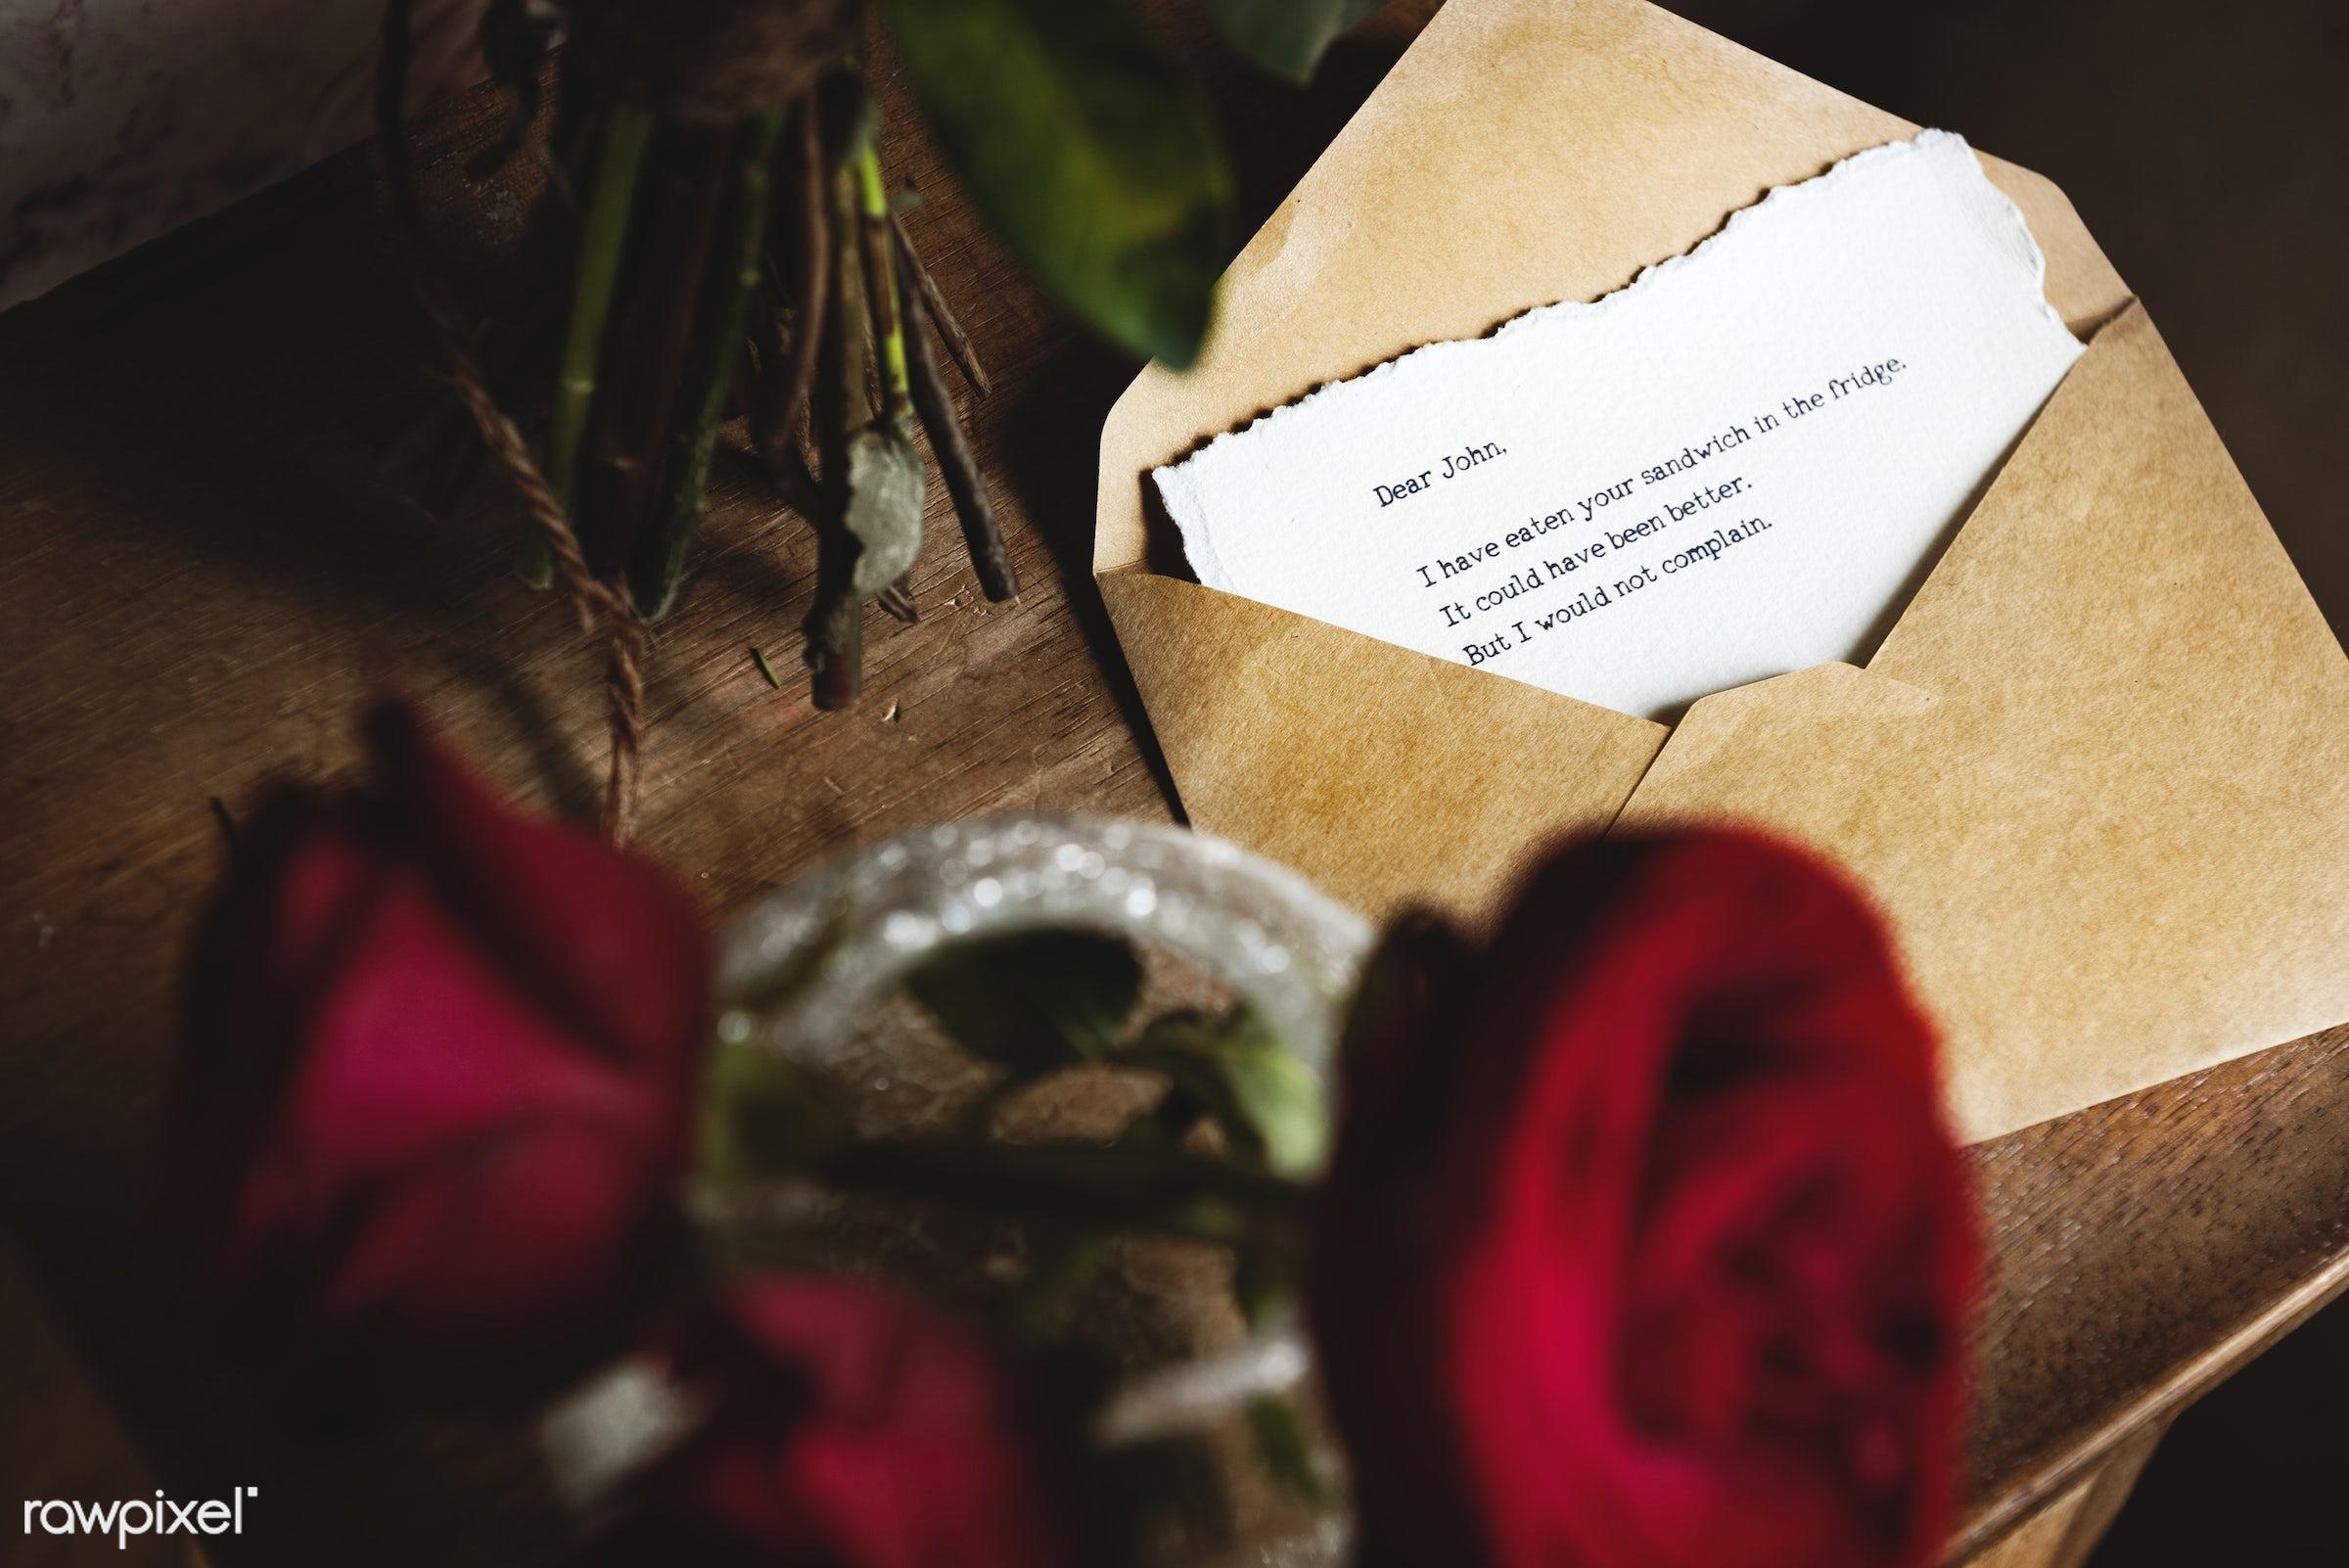 arranagement, attach, attached, attractive, beautiful, bloom, card, communication, complain, dear, decoration, decorative,...